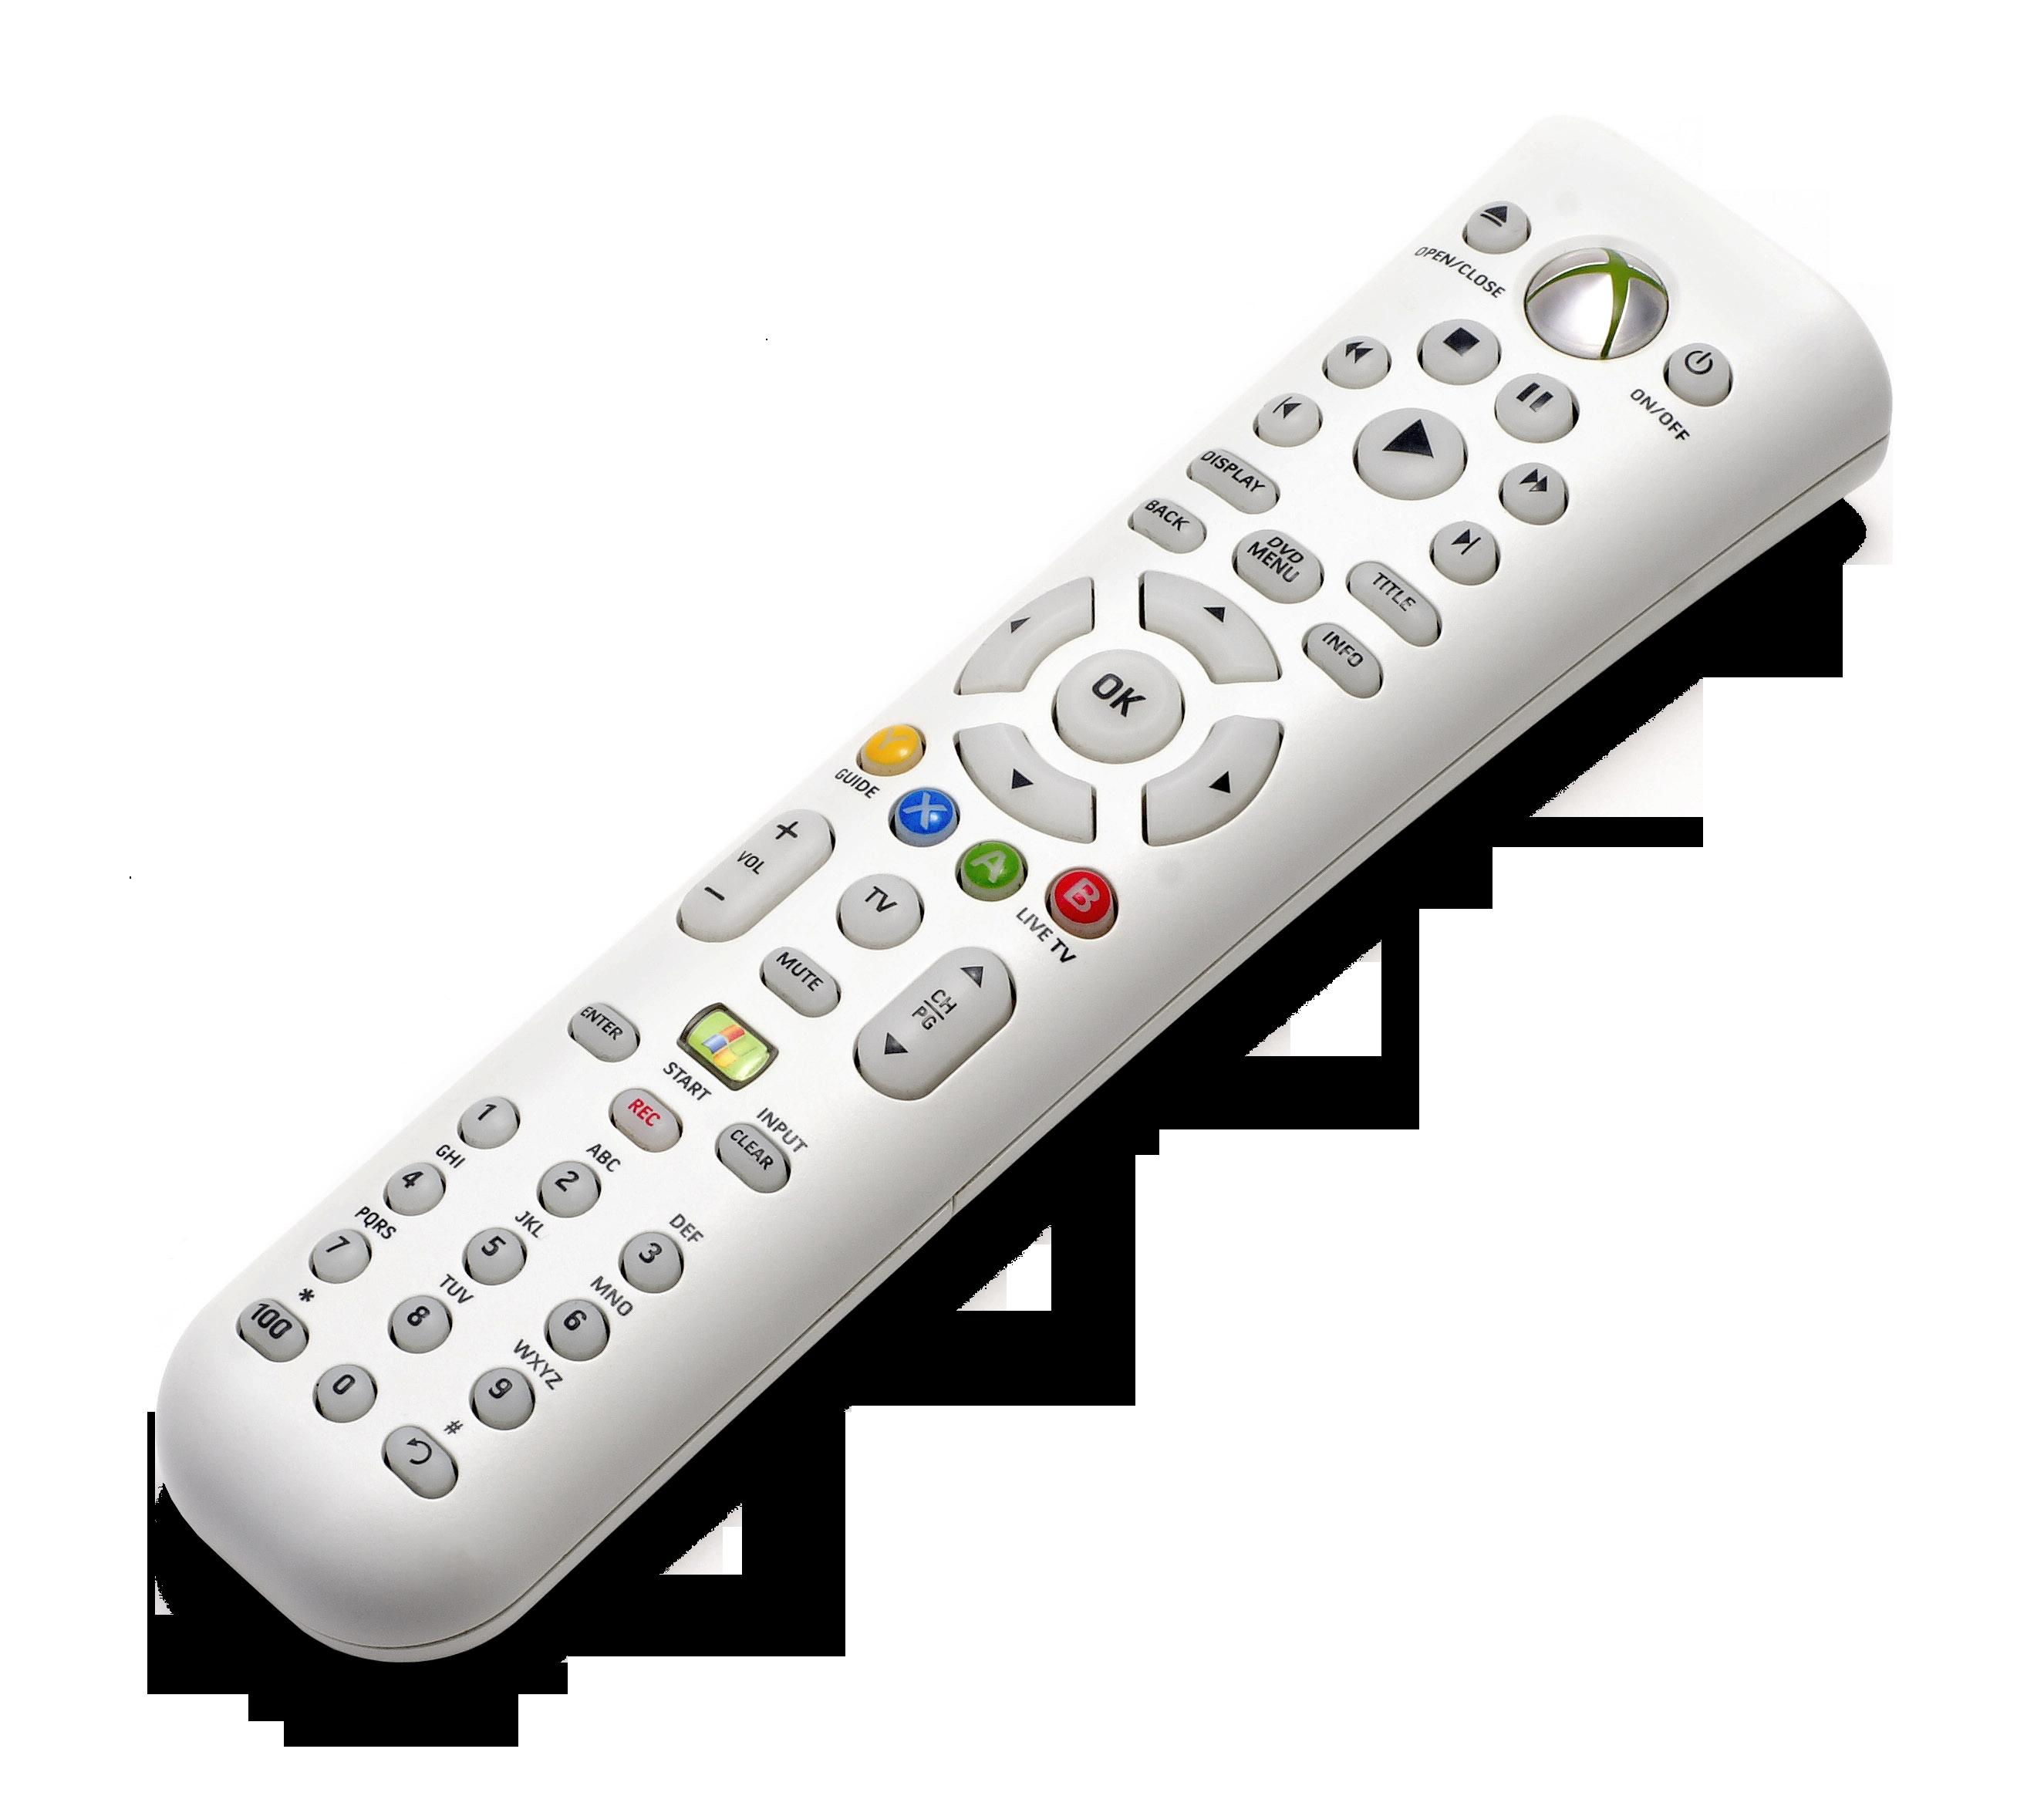 File:Xbox 360 remote.png.